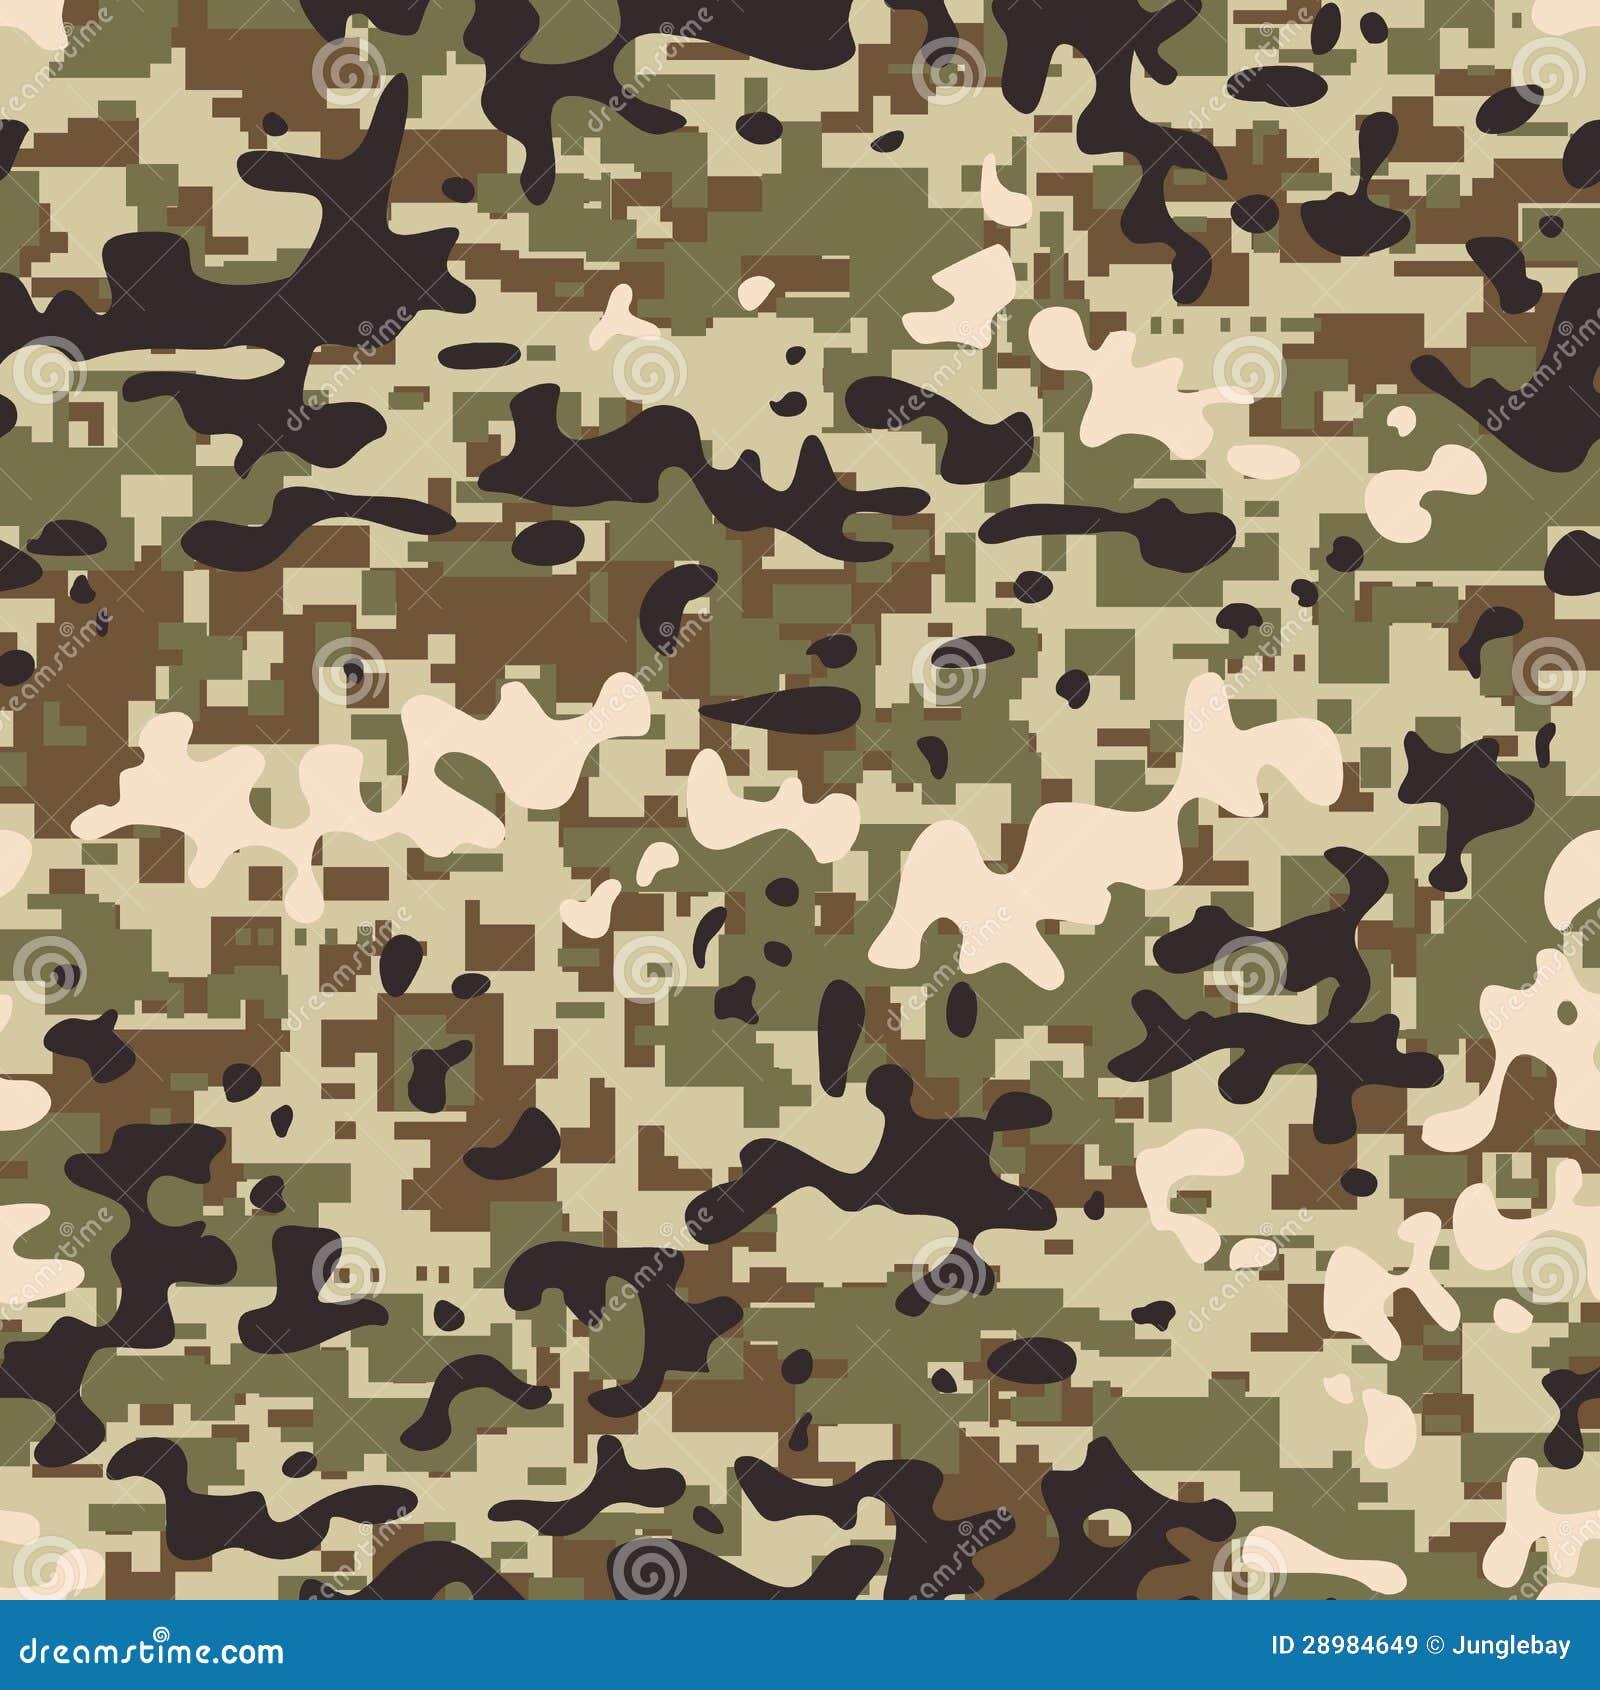 digital multicam camo stock vector illustration of camouflage